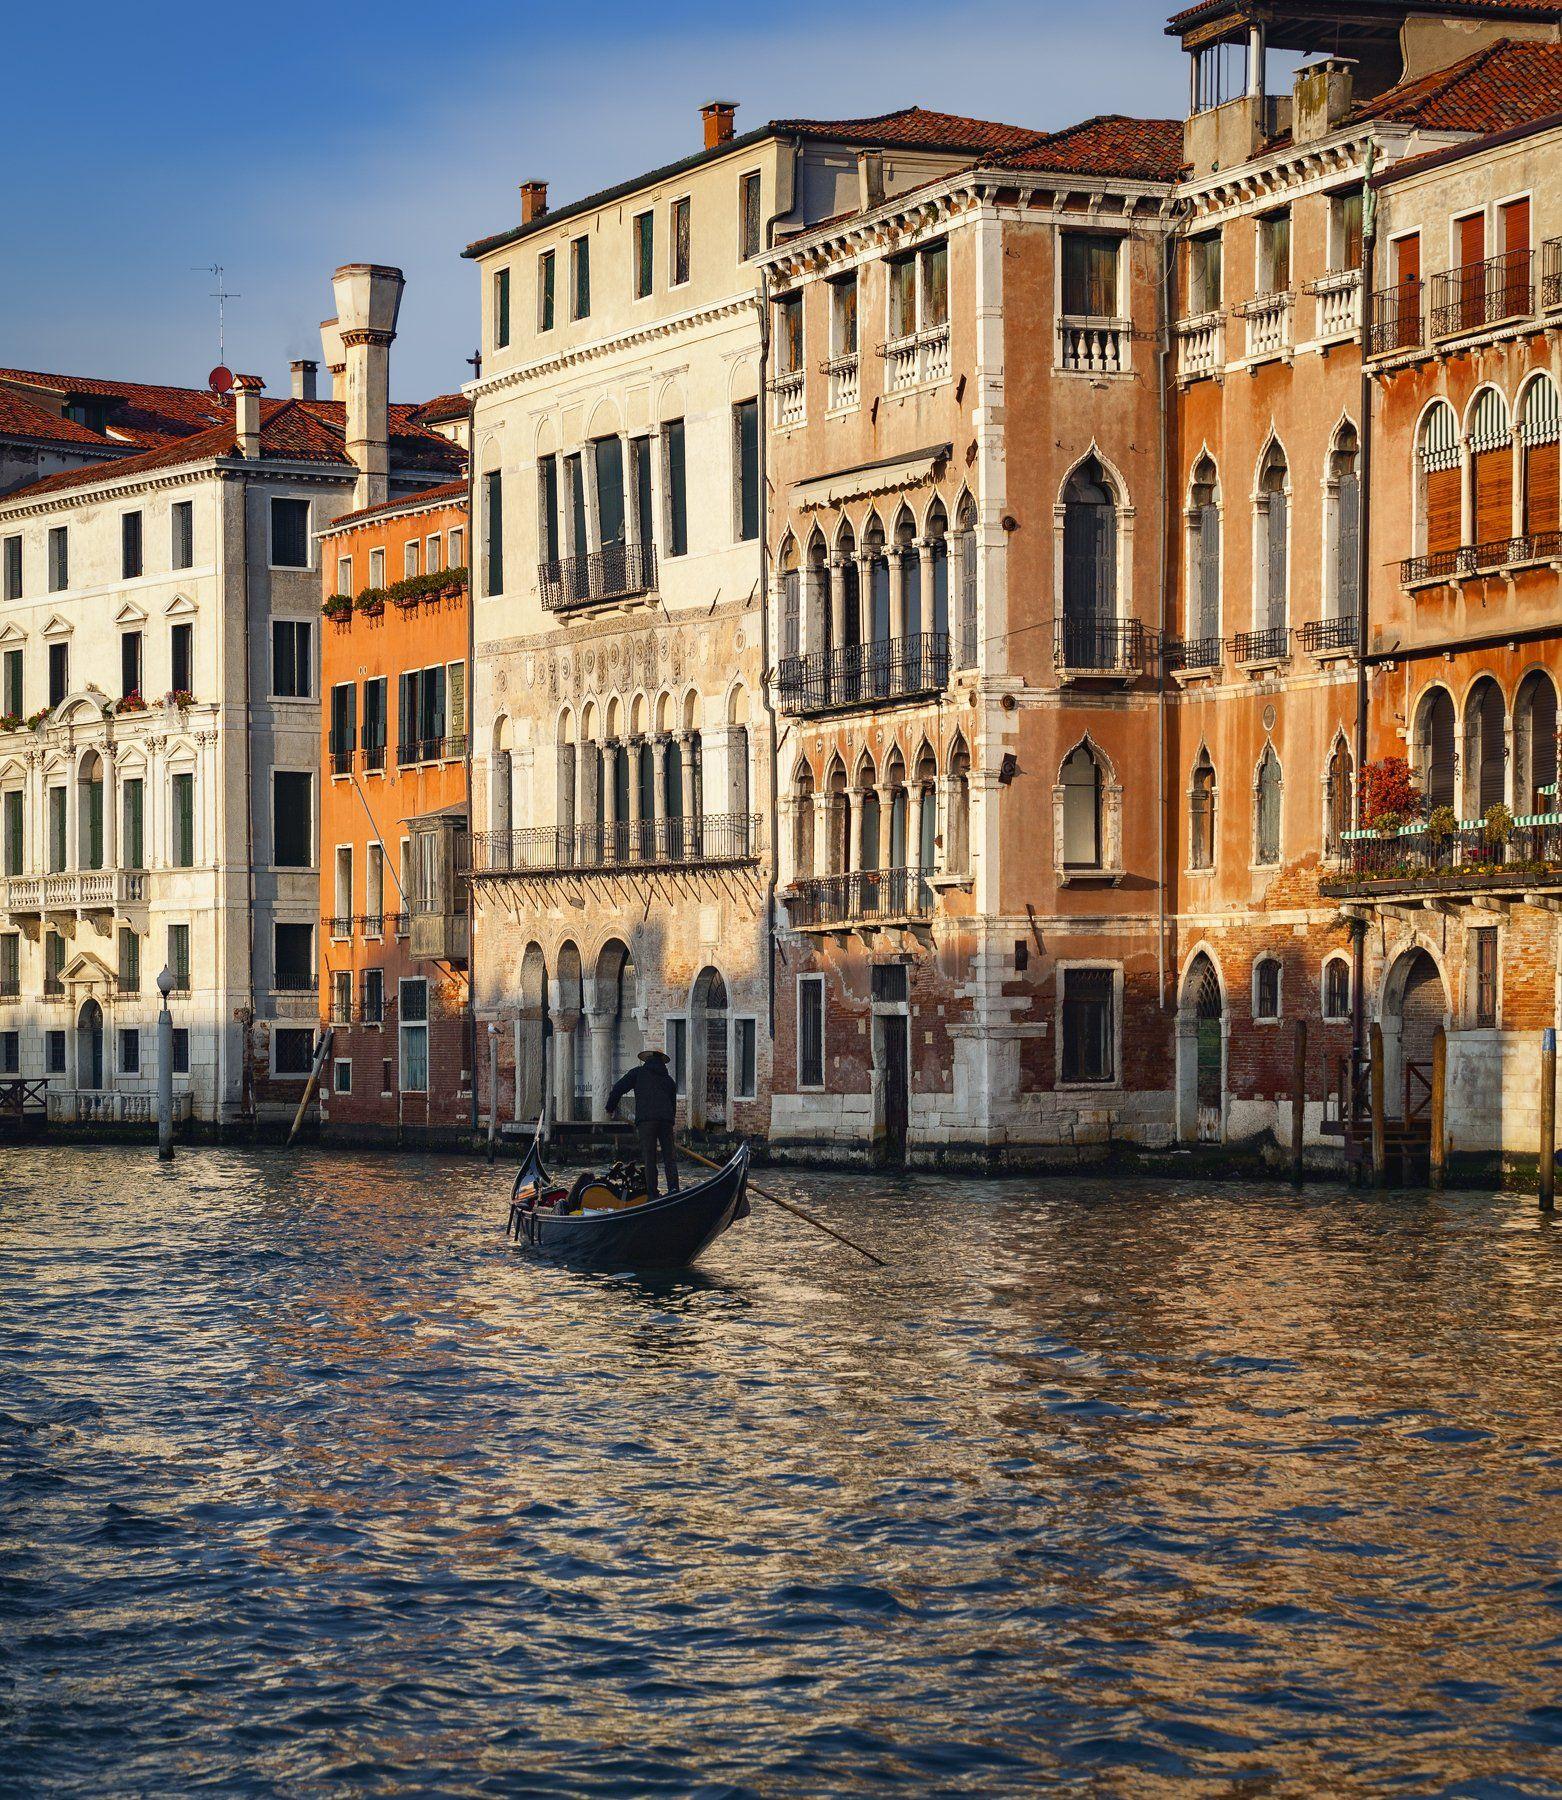 венеция, италия, канал, Alexandr Bezmolitvenny